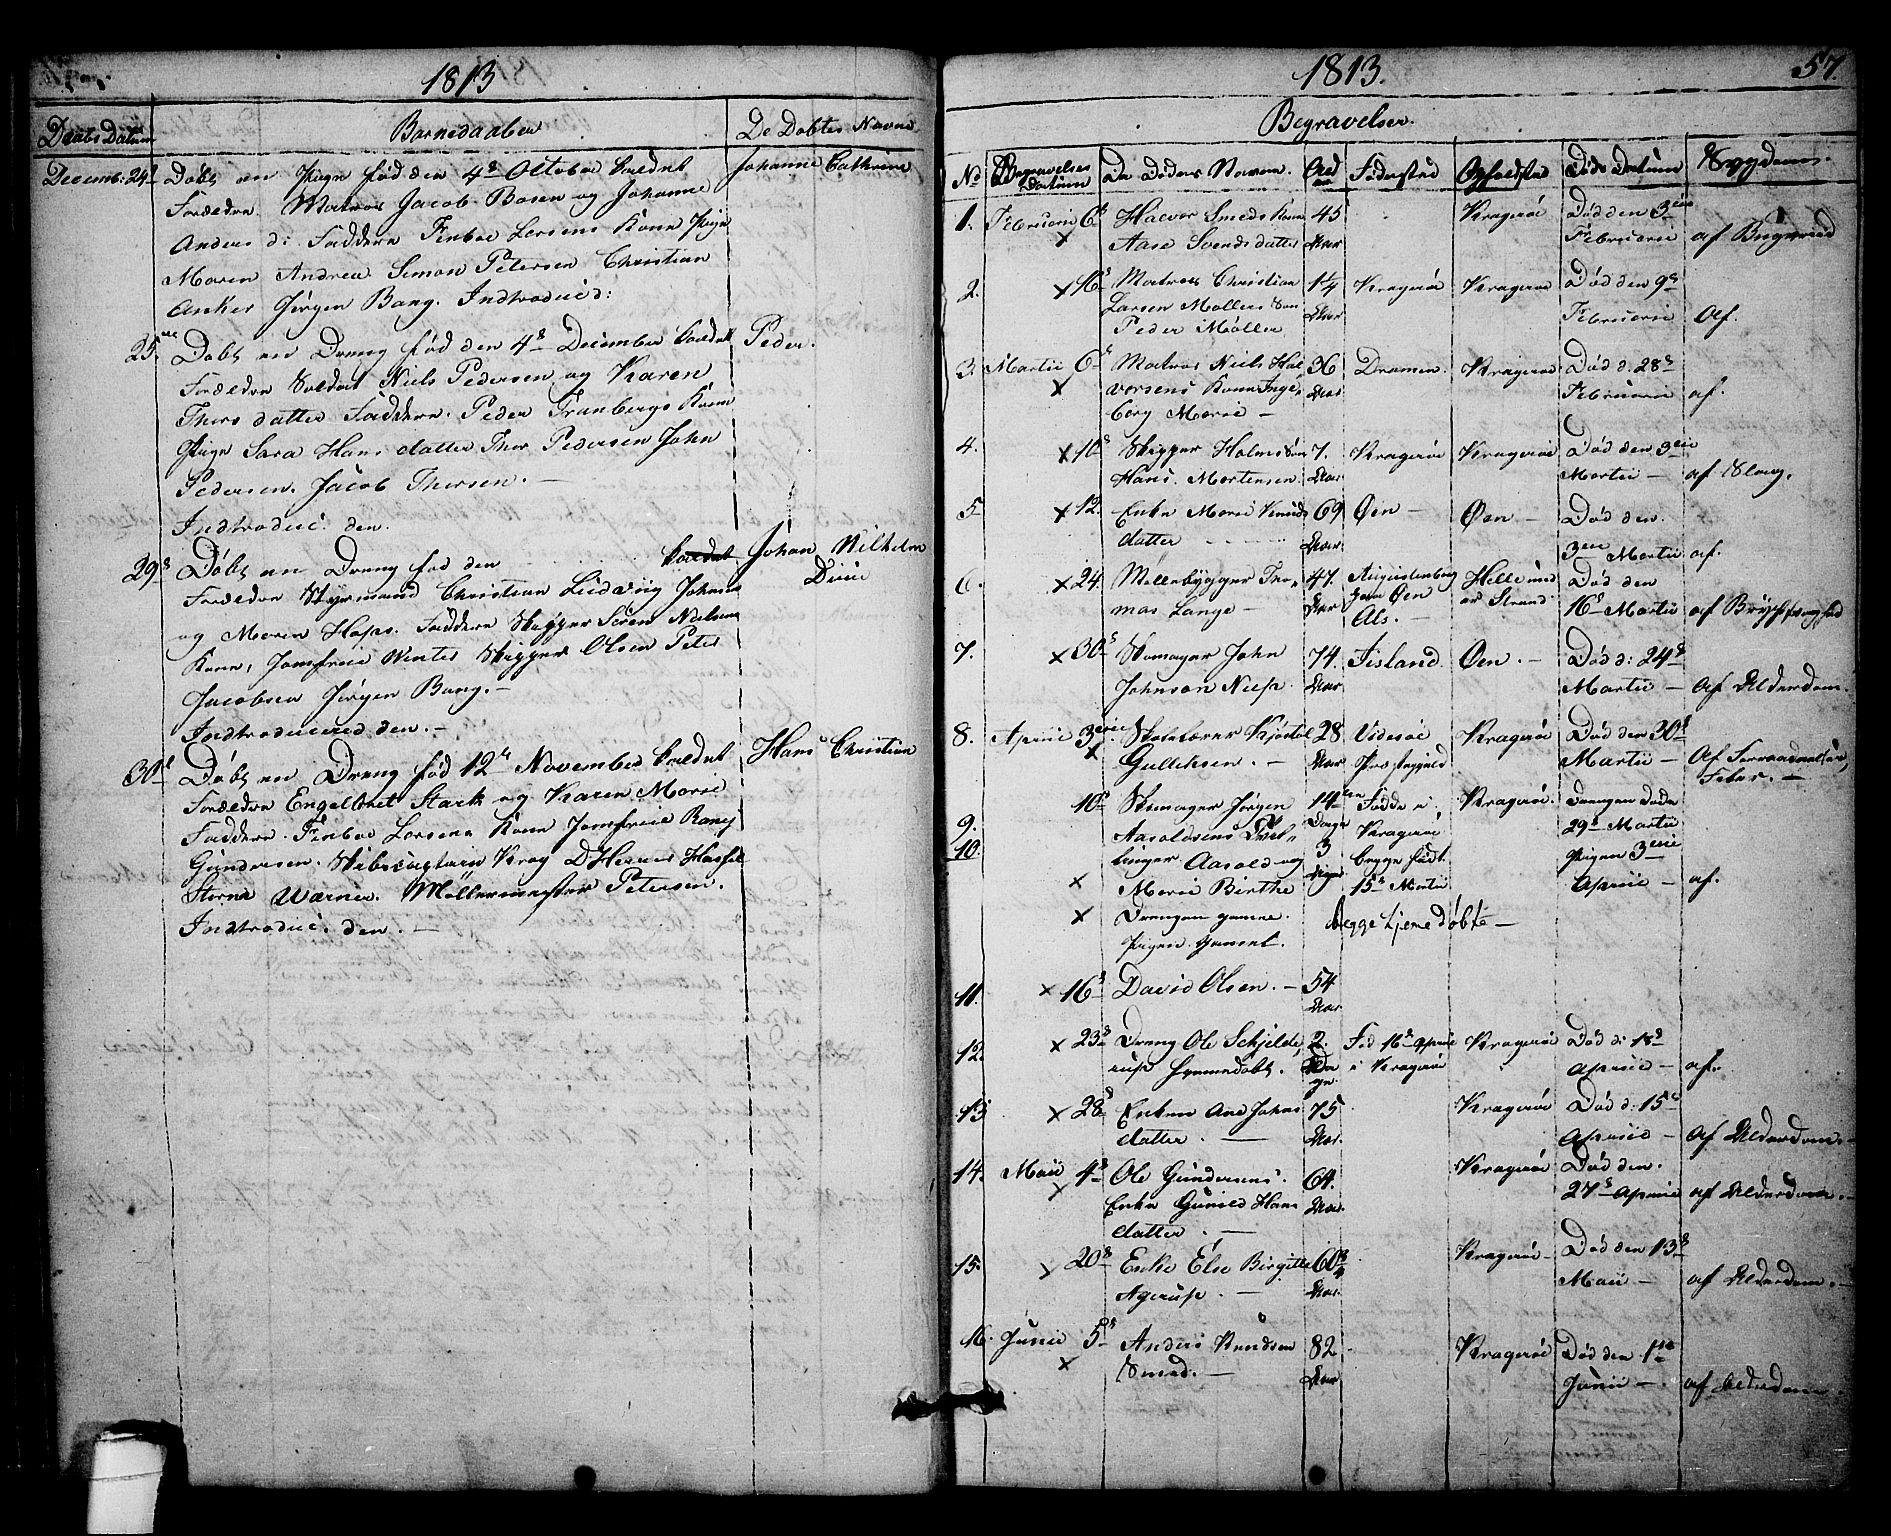 SAKO, Kragerø kirkebøker, F/Fa/L0003: Ministerialbok nr. 3, 1802-1813, s. 57